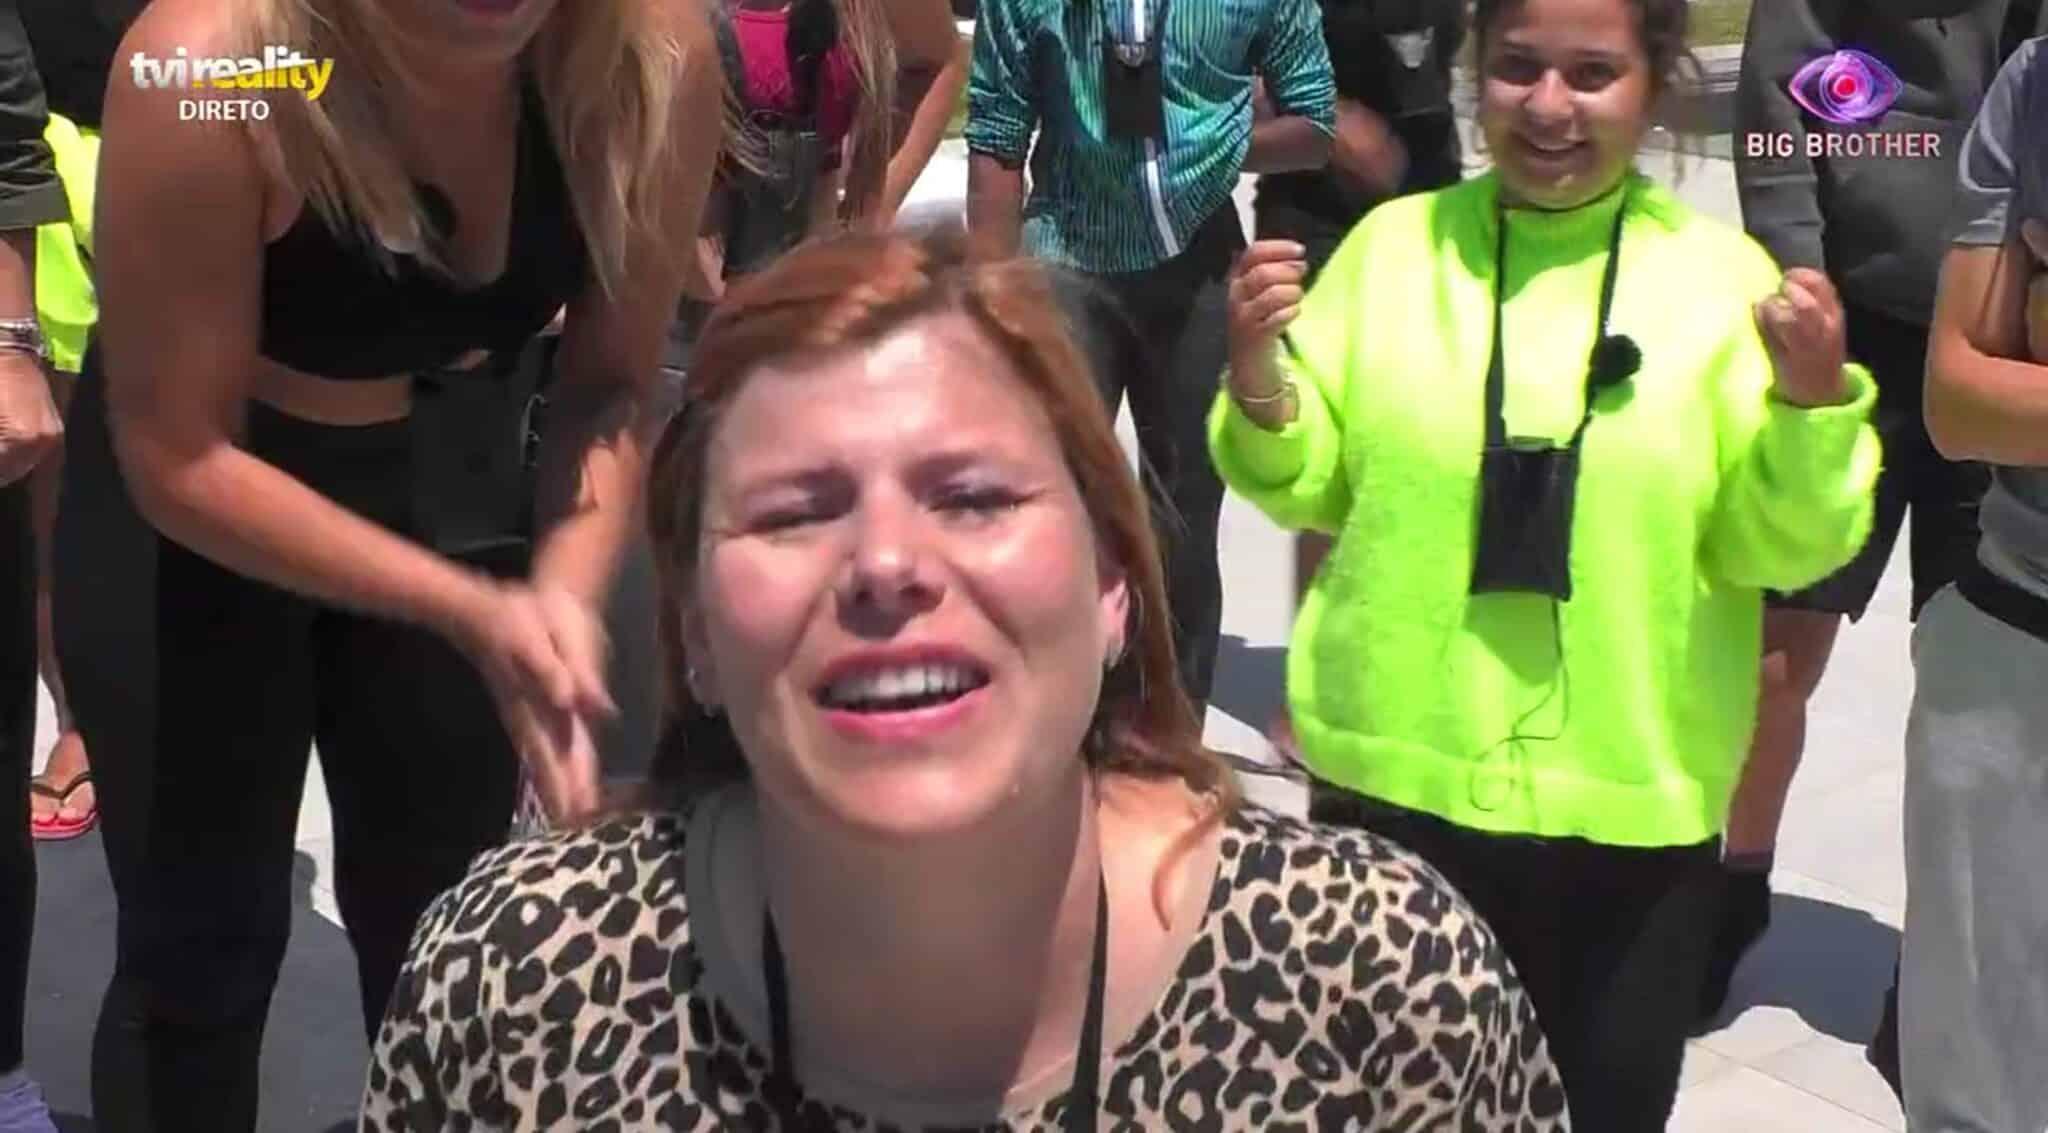 Big Brother Noelia Pedida Casamento 2 Scaled Emoção! Noélia Pedida Em Casamento No 'Big Brother'